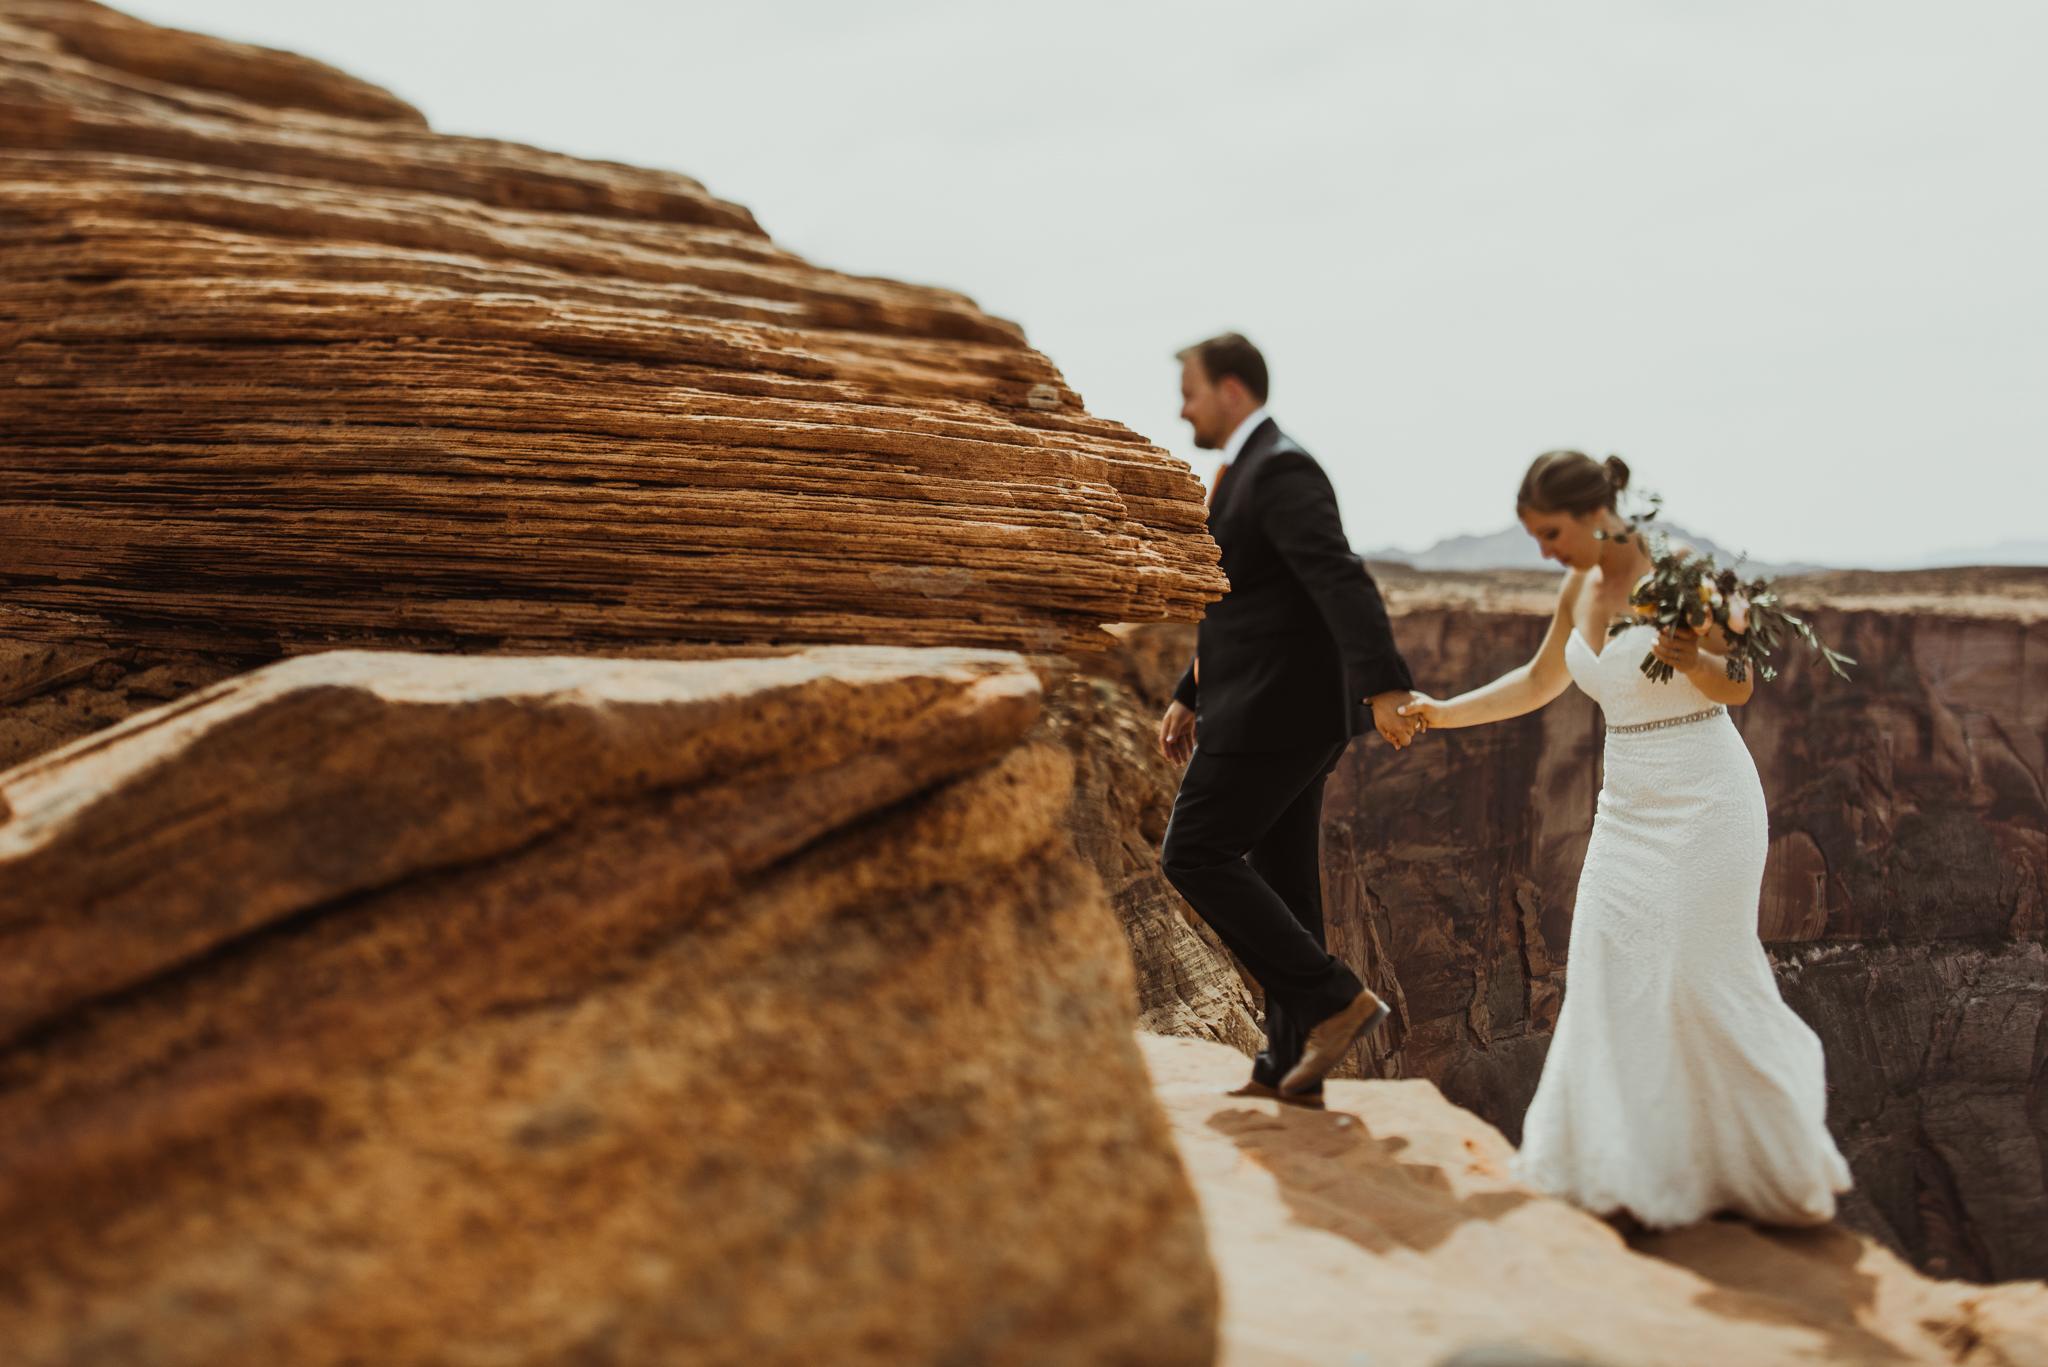 ©Isaiah + Taylor Photography - Lake Powell Elopement & Antelope Canyon & Horseshoe Bend, Page, Arizona-106.jpg